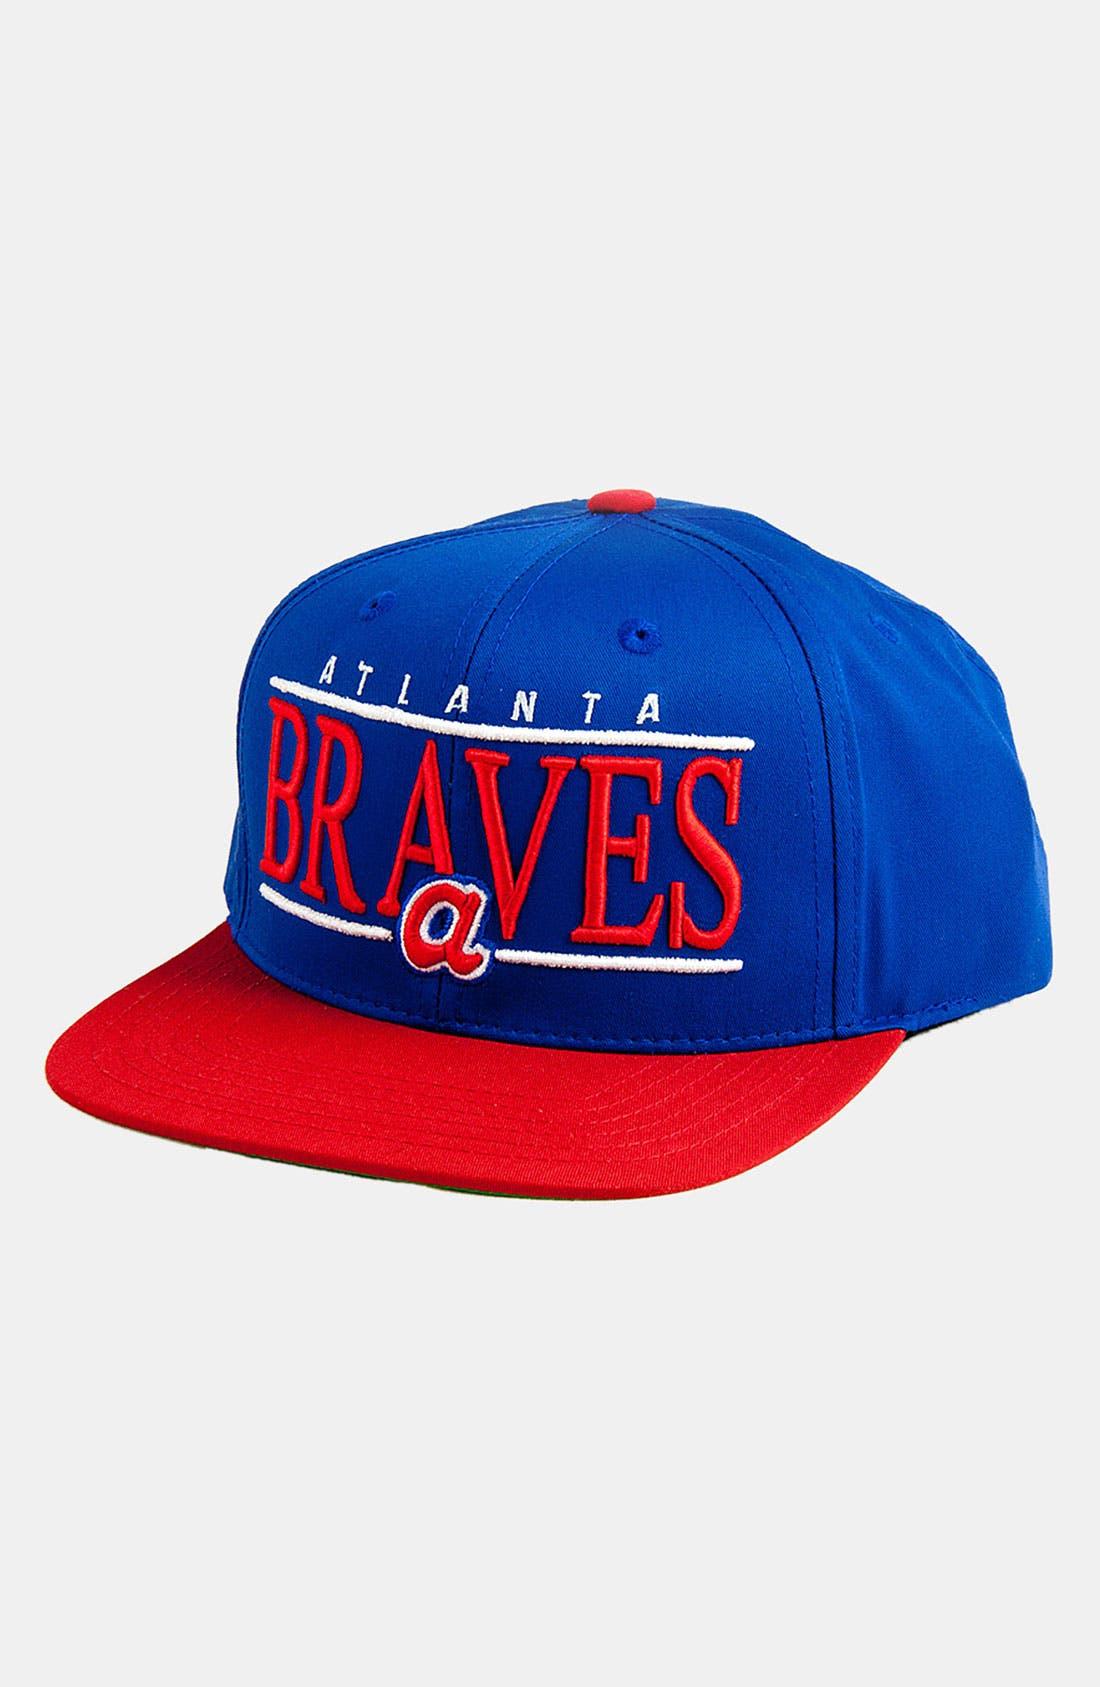 Main Image - American Needle 'Atlanta Braves - Nineties' Twill Snapback Baseball Cap